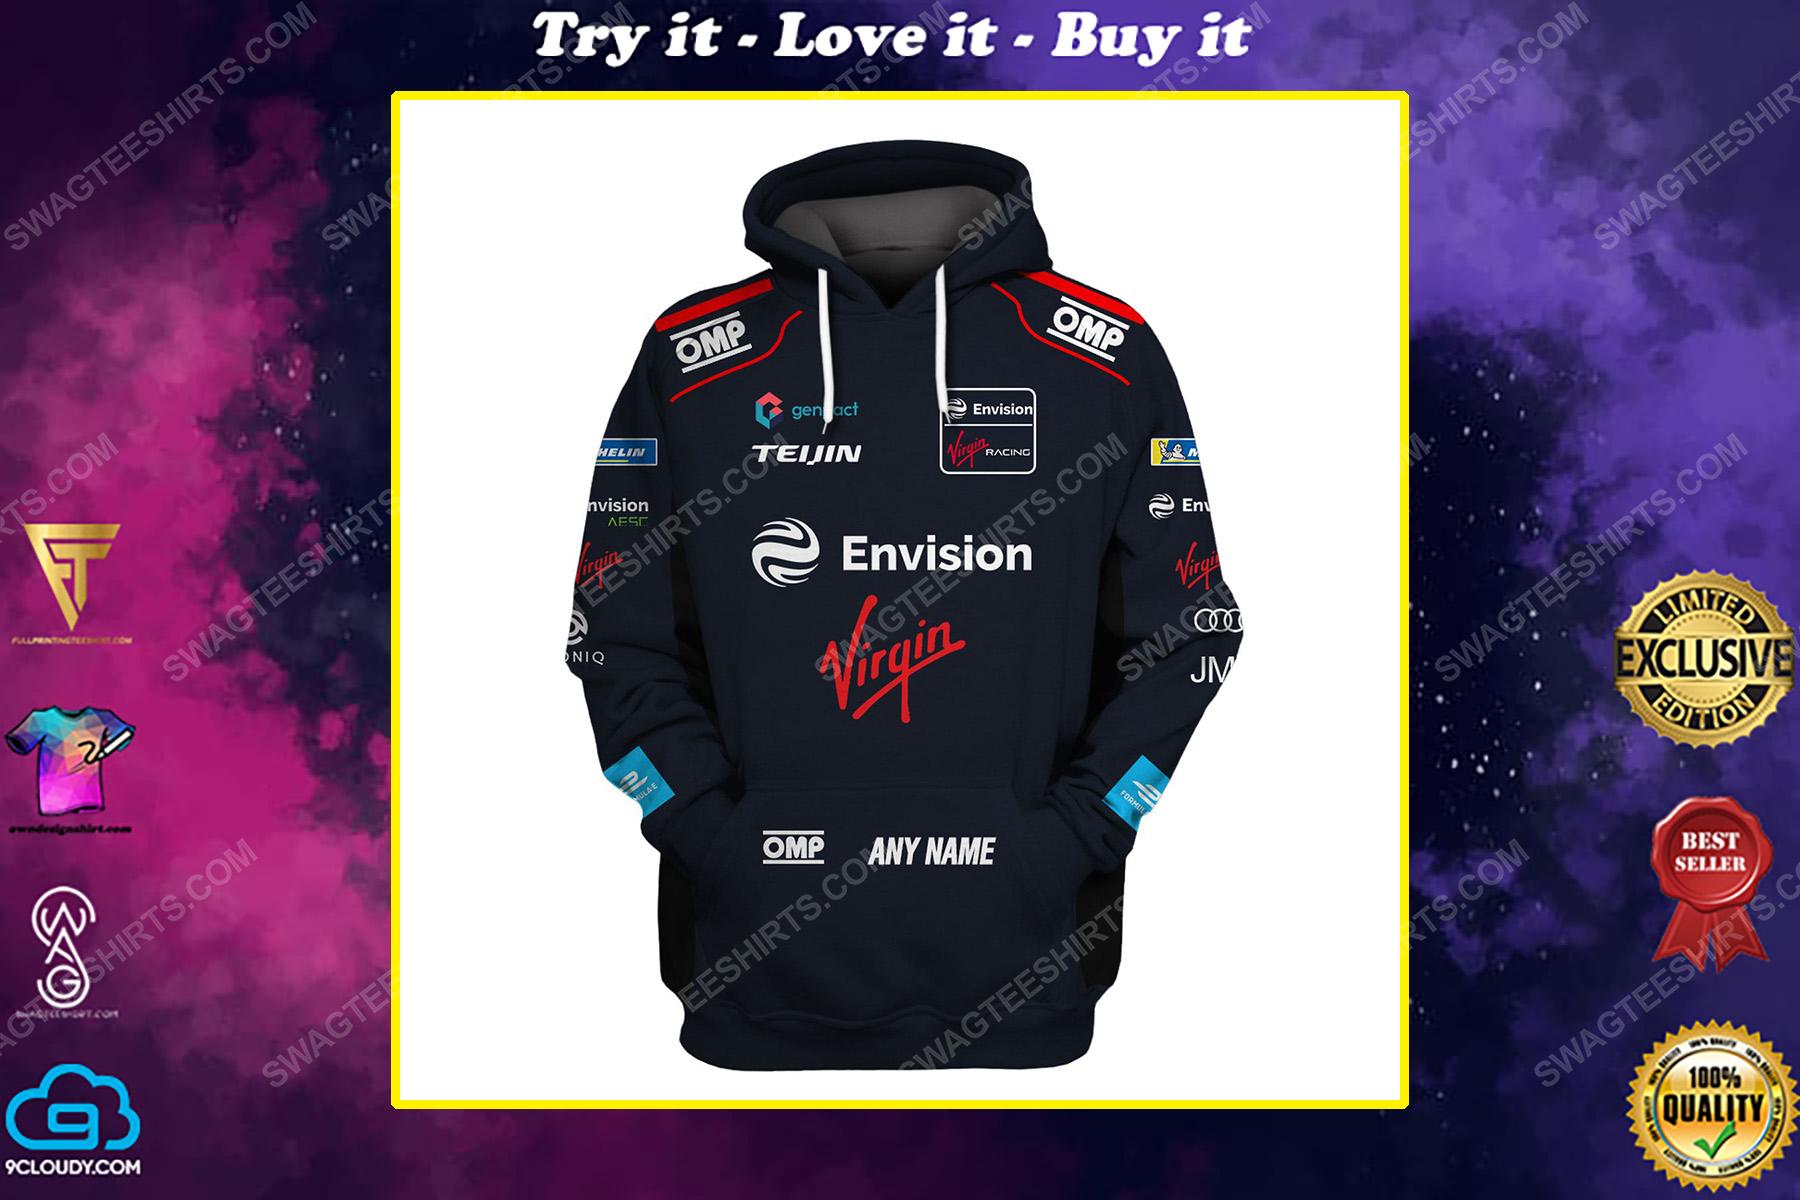 Custom envision virgin racing team motorsport full printing shirt